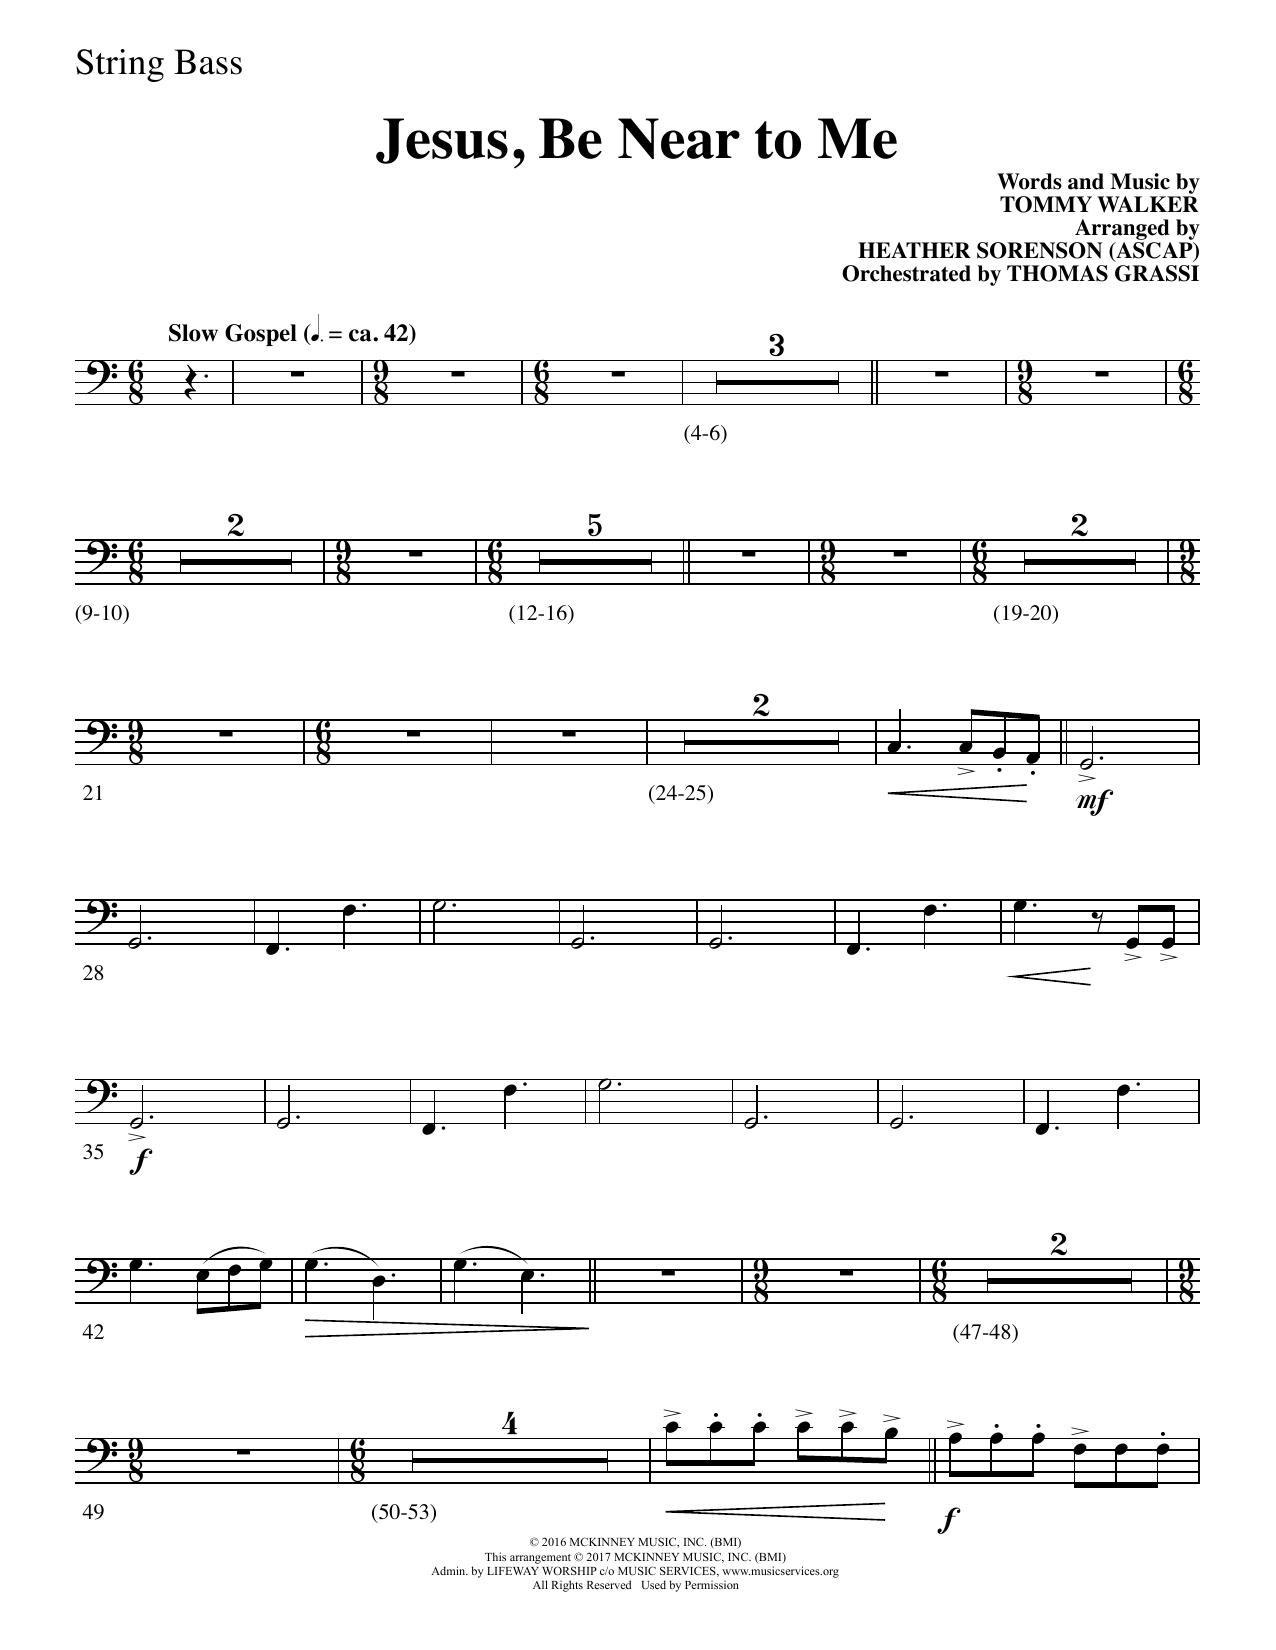 Tommy Walker - Jesus, Be Near to Me - String Bass